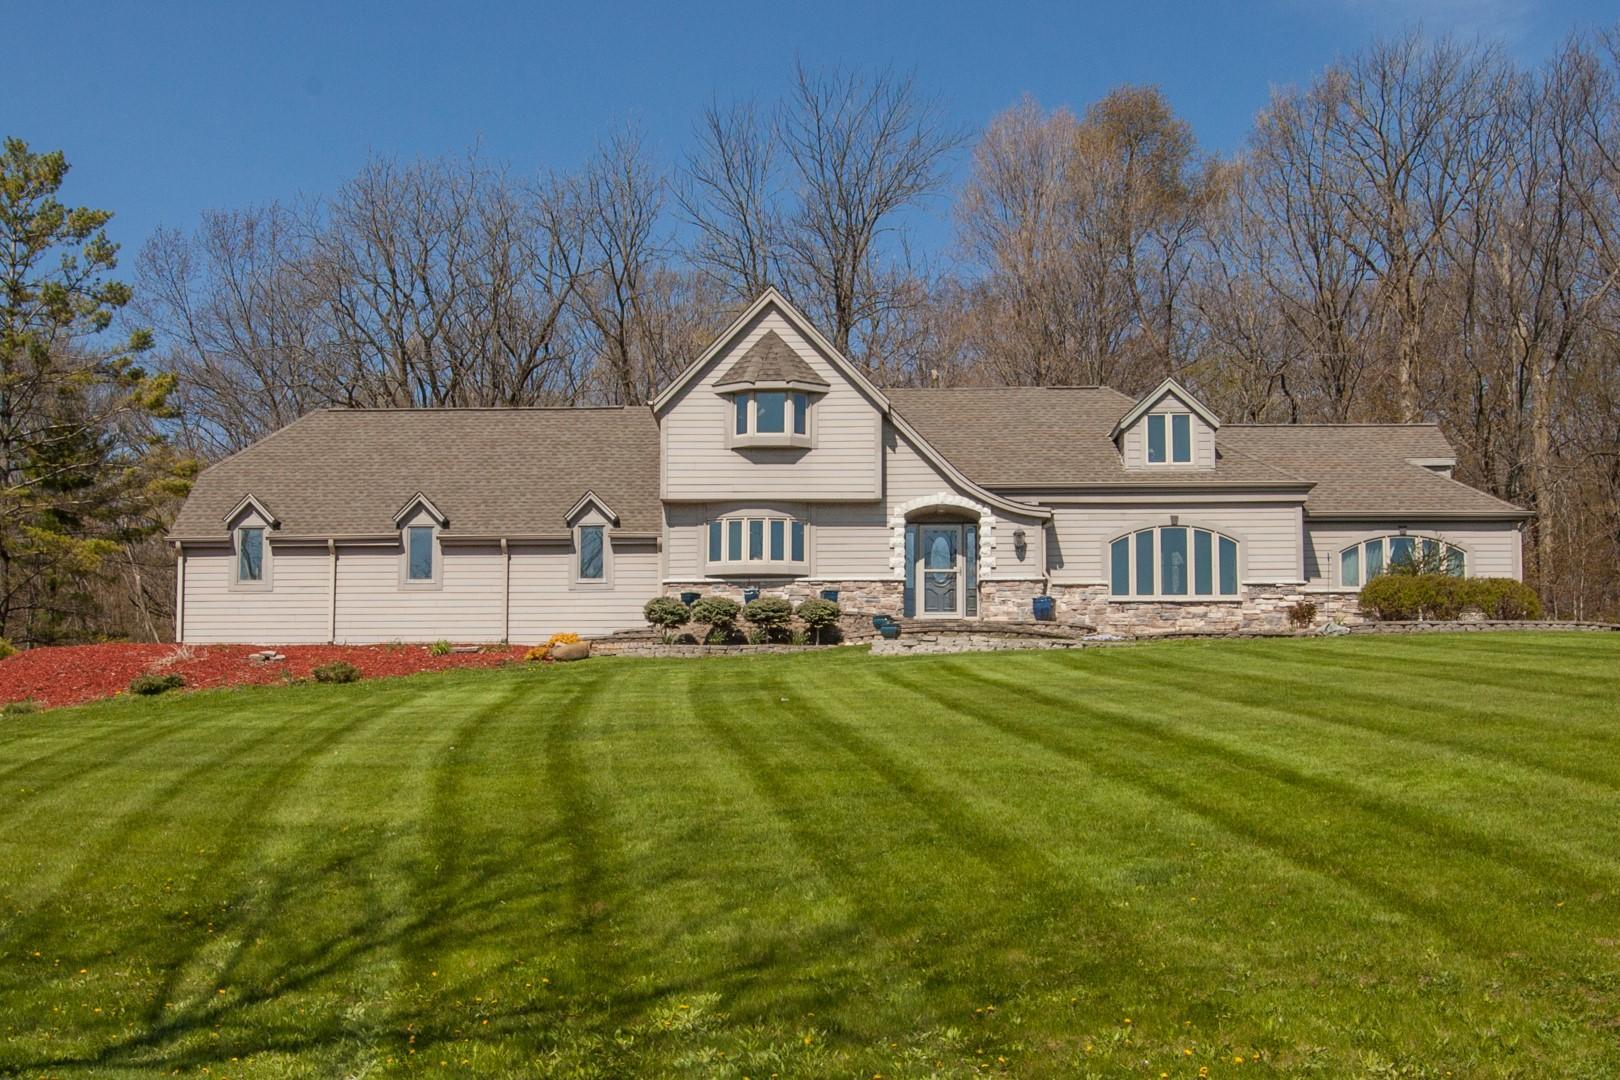 S56W22777 Woodside DR, Waukesha, Wisconsin 53189, 4 Bedrooms Bedrooms, 9 Rooms Rooms,2 BathroomsBathrooms,Single-Family,For Sale,Woodside DR,1688991